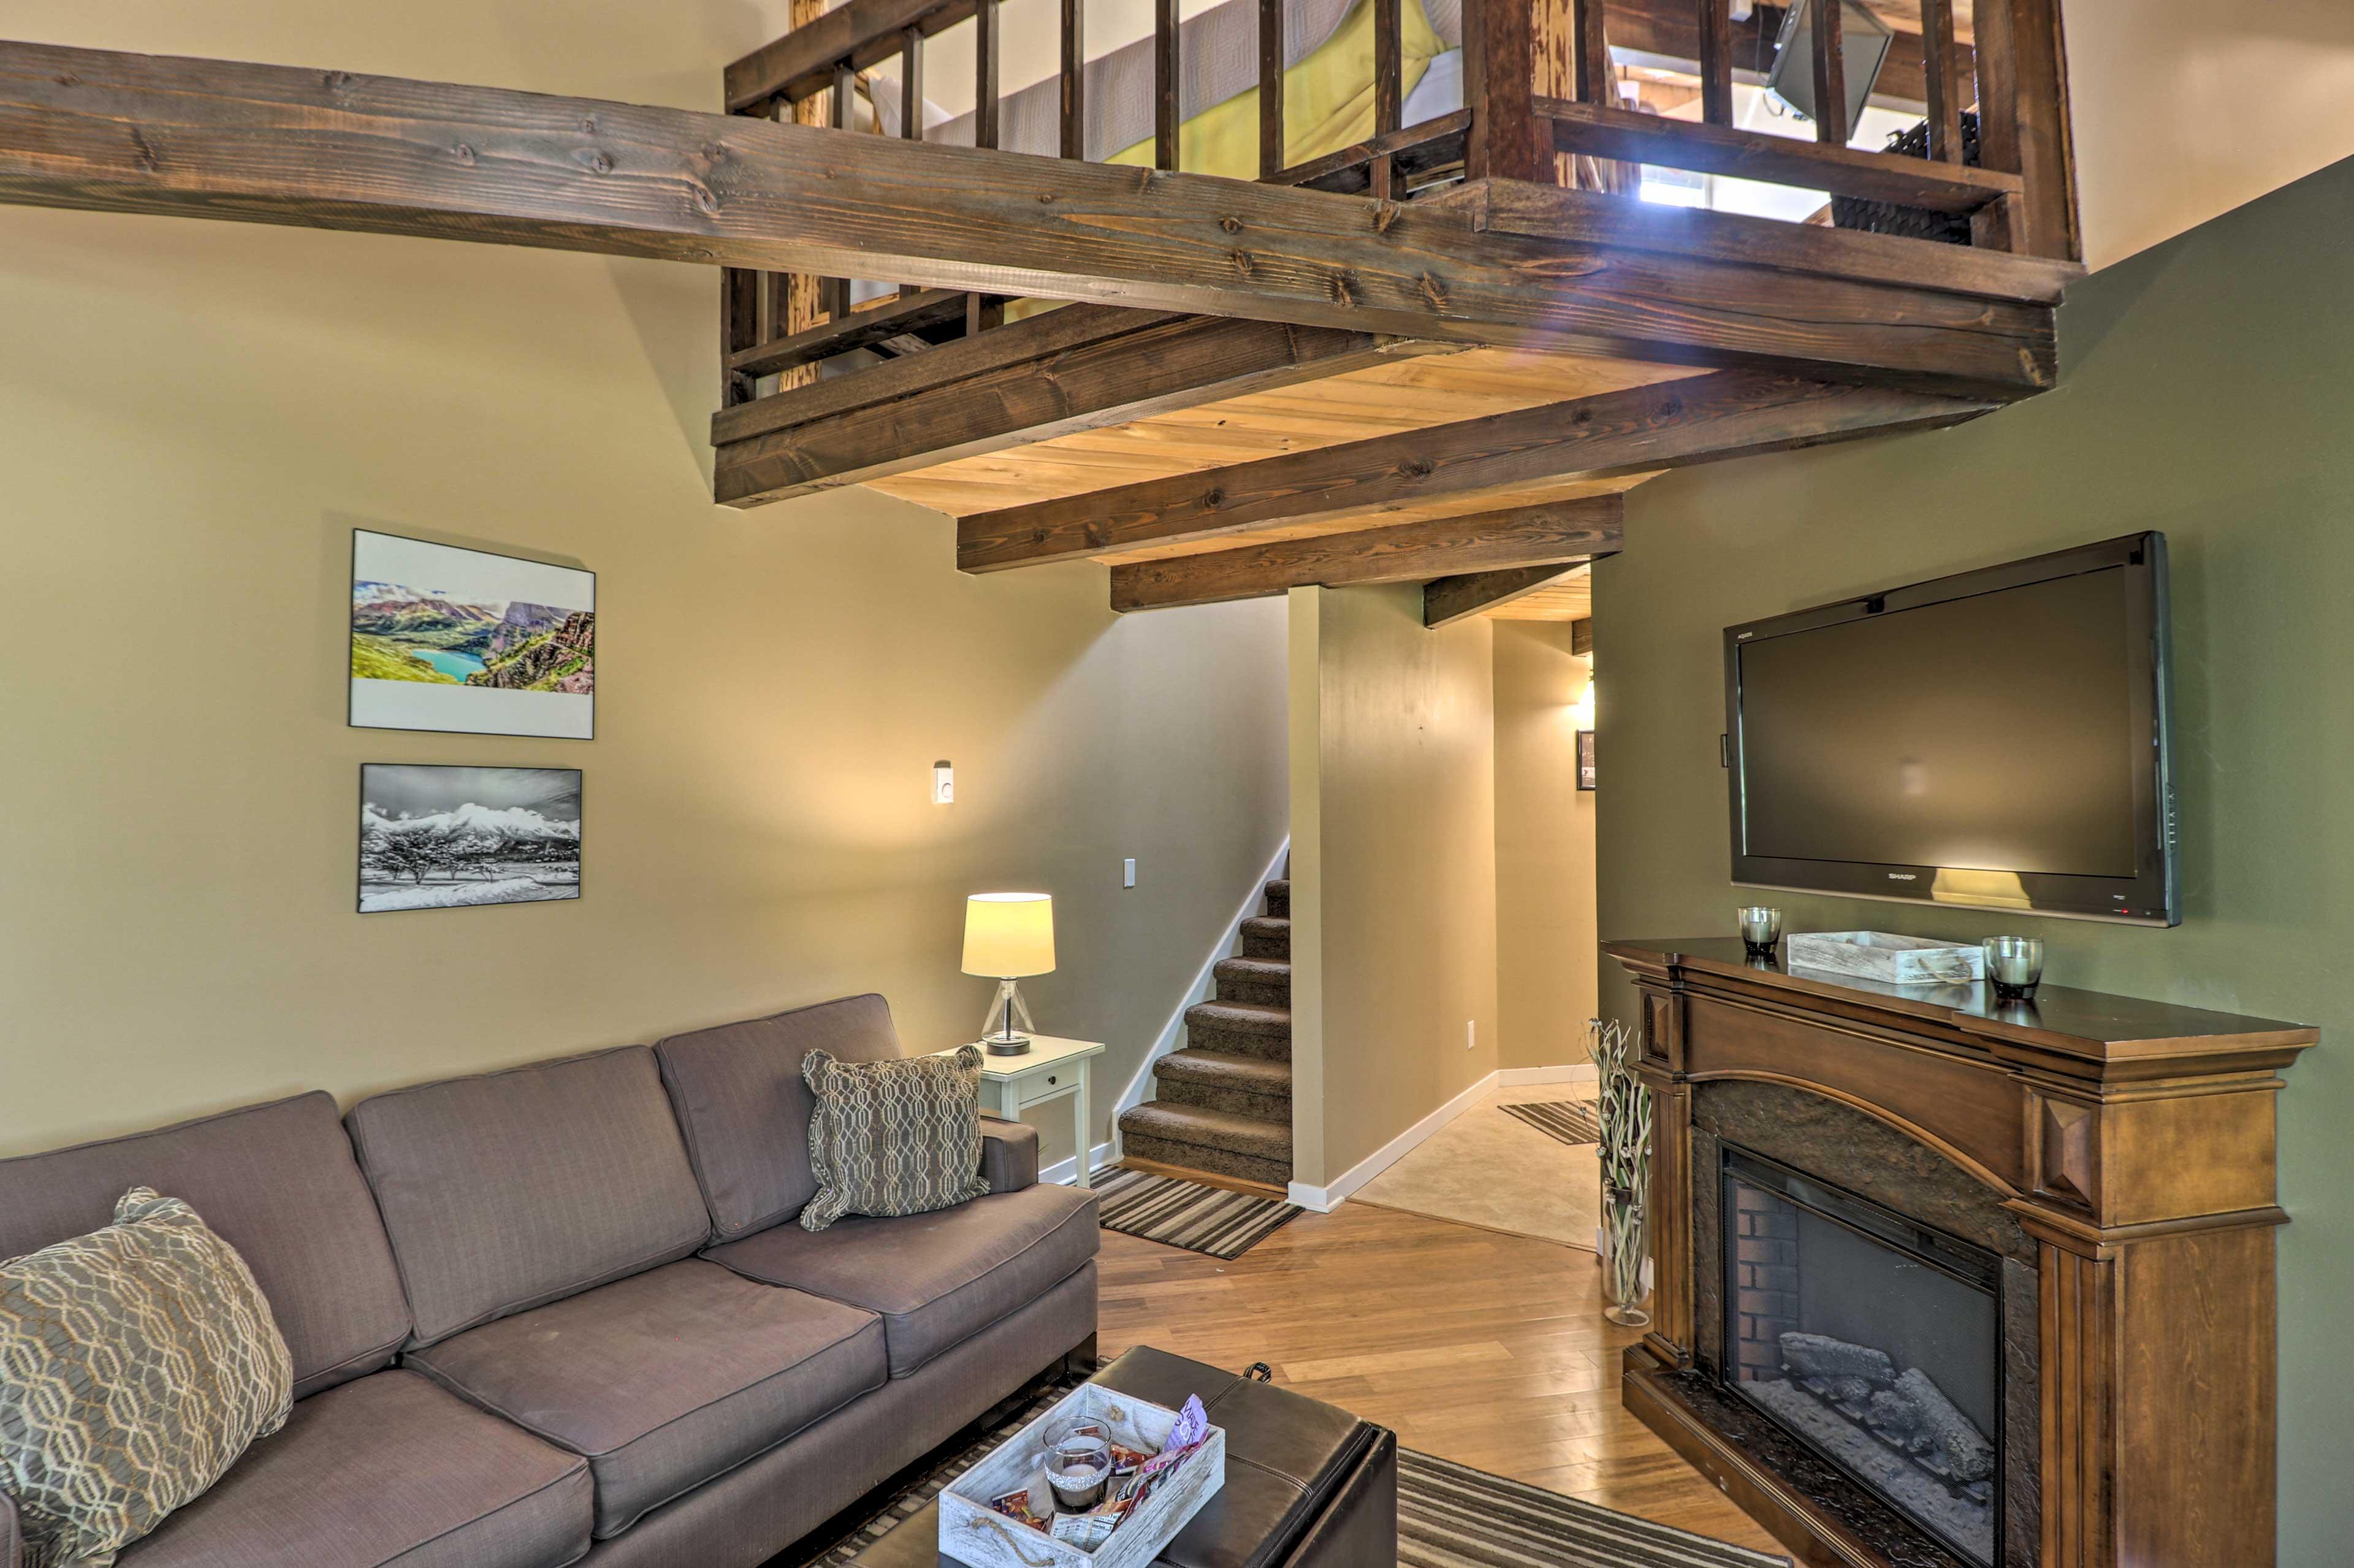 Head upstairs to the loft bedroom!